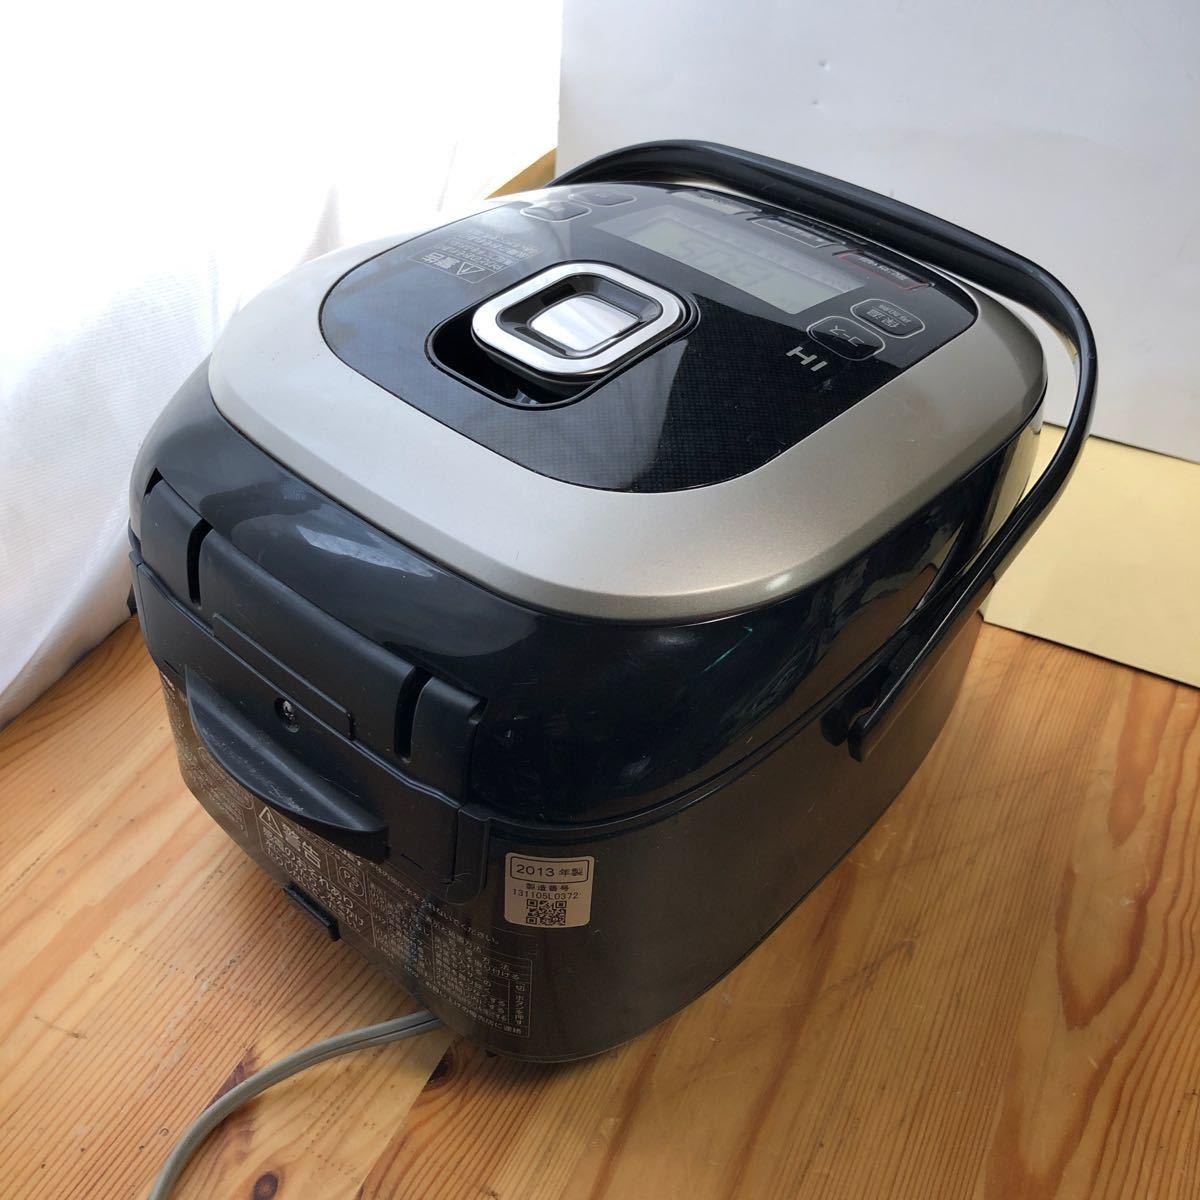 Panasonic パナソニックSR-HB103 炊飯器 炊飯器5.5合 圧力IH